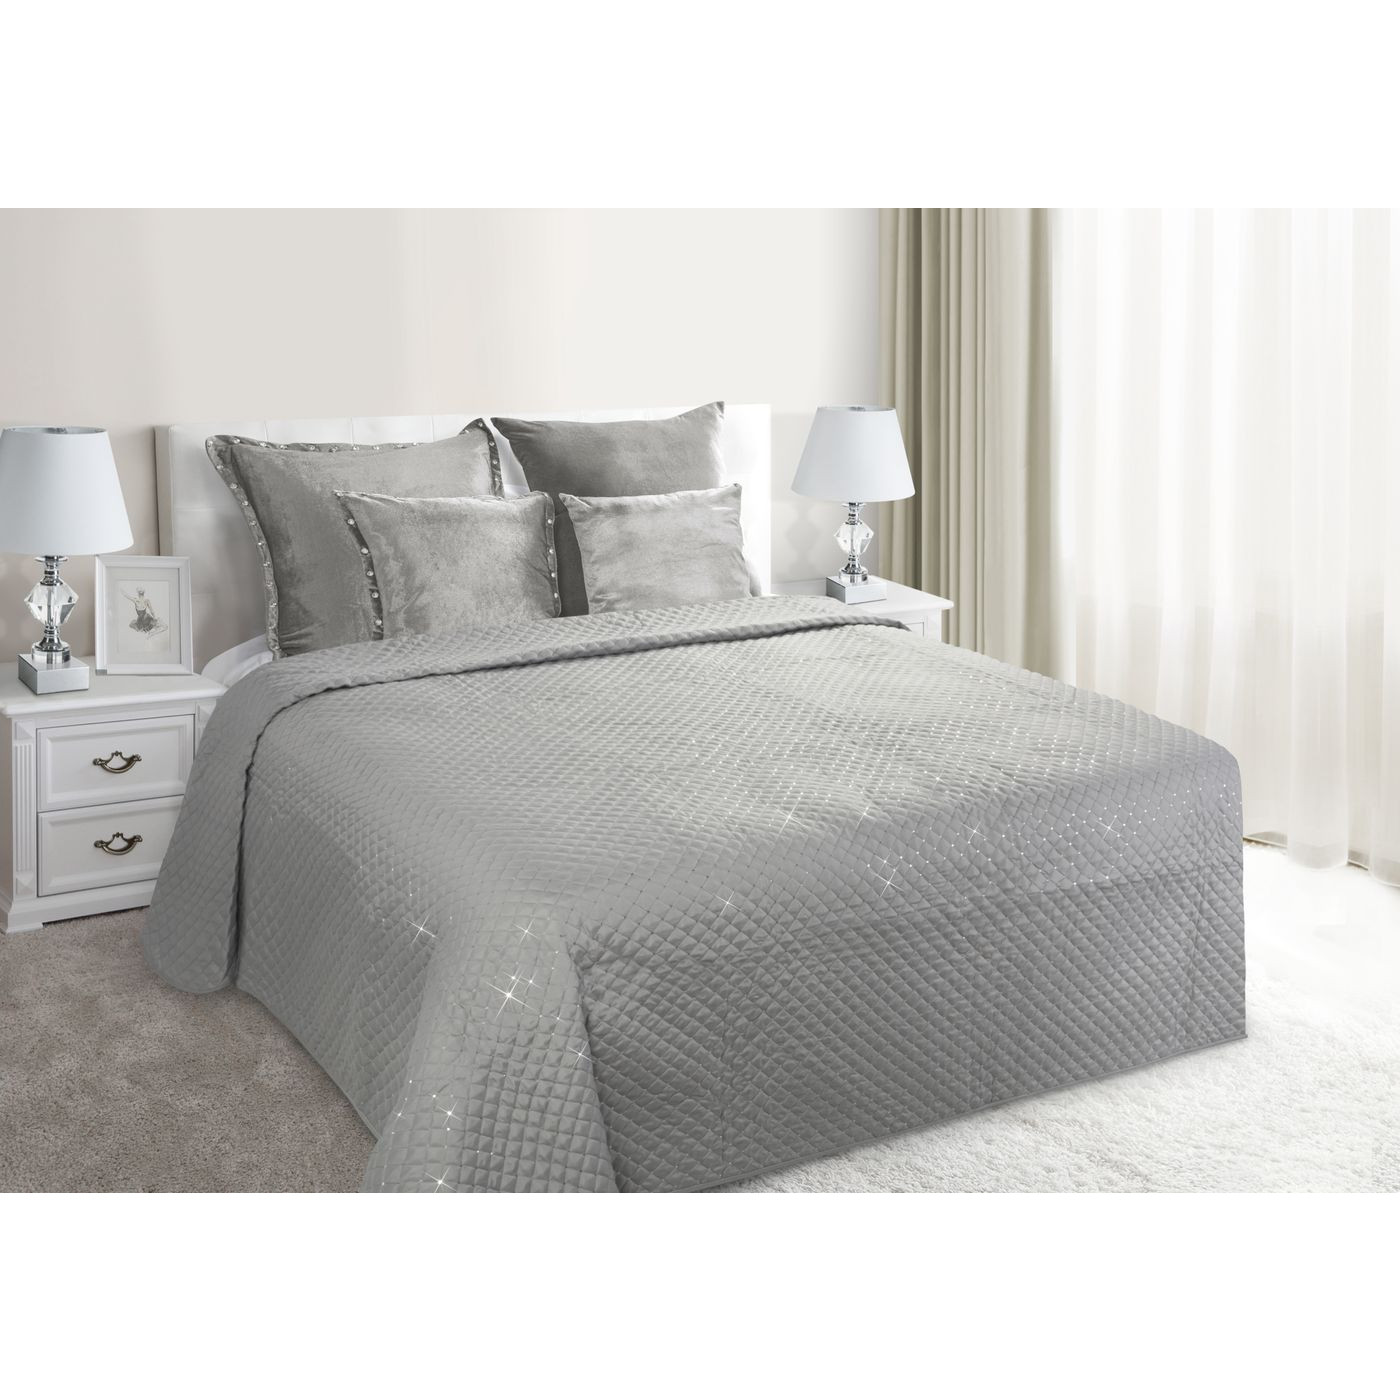 Narzuta na łóżko miękka zdobiona cekinami 170x210 cm srebrna